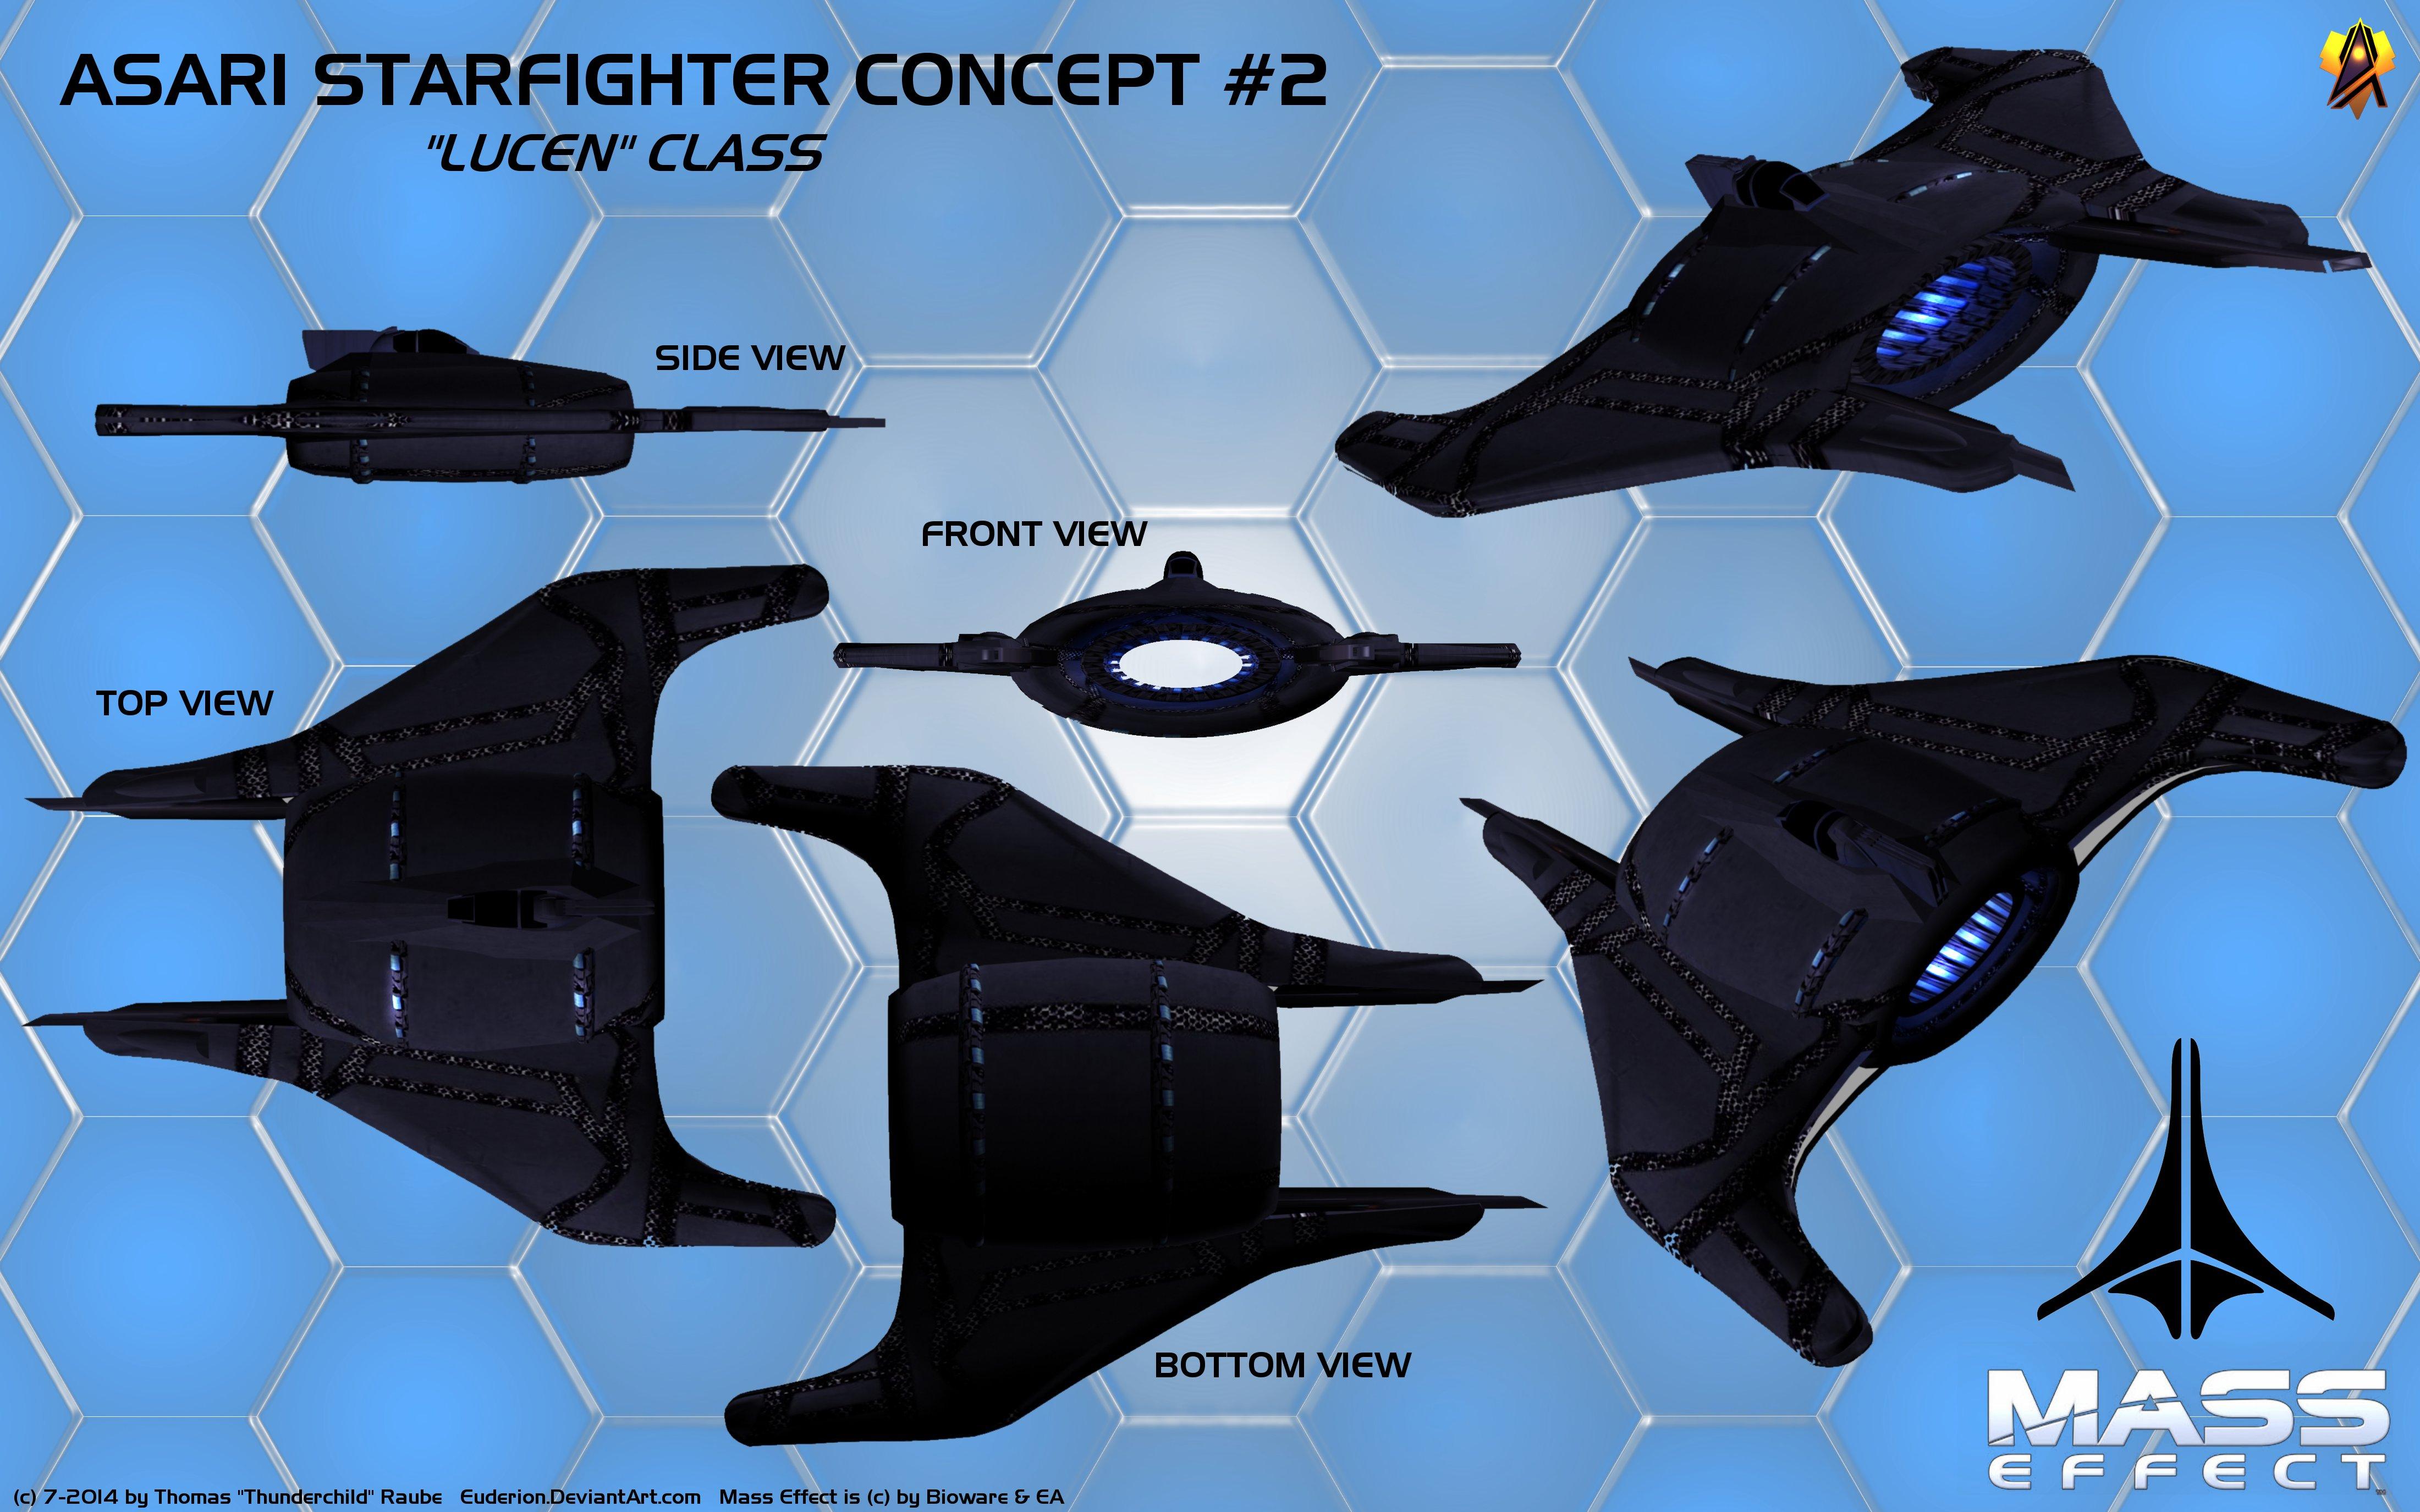 Asari Starfighter Concept 2 (Lucen class) by Euderion